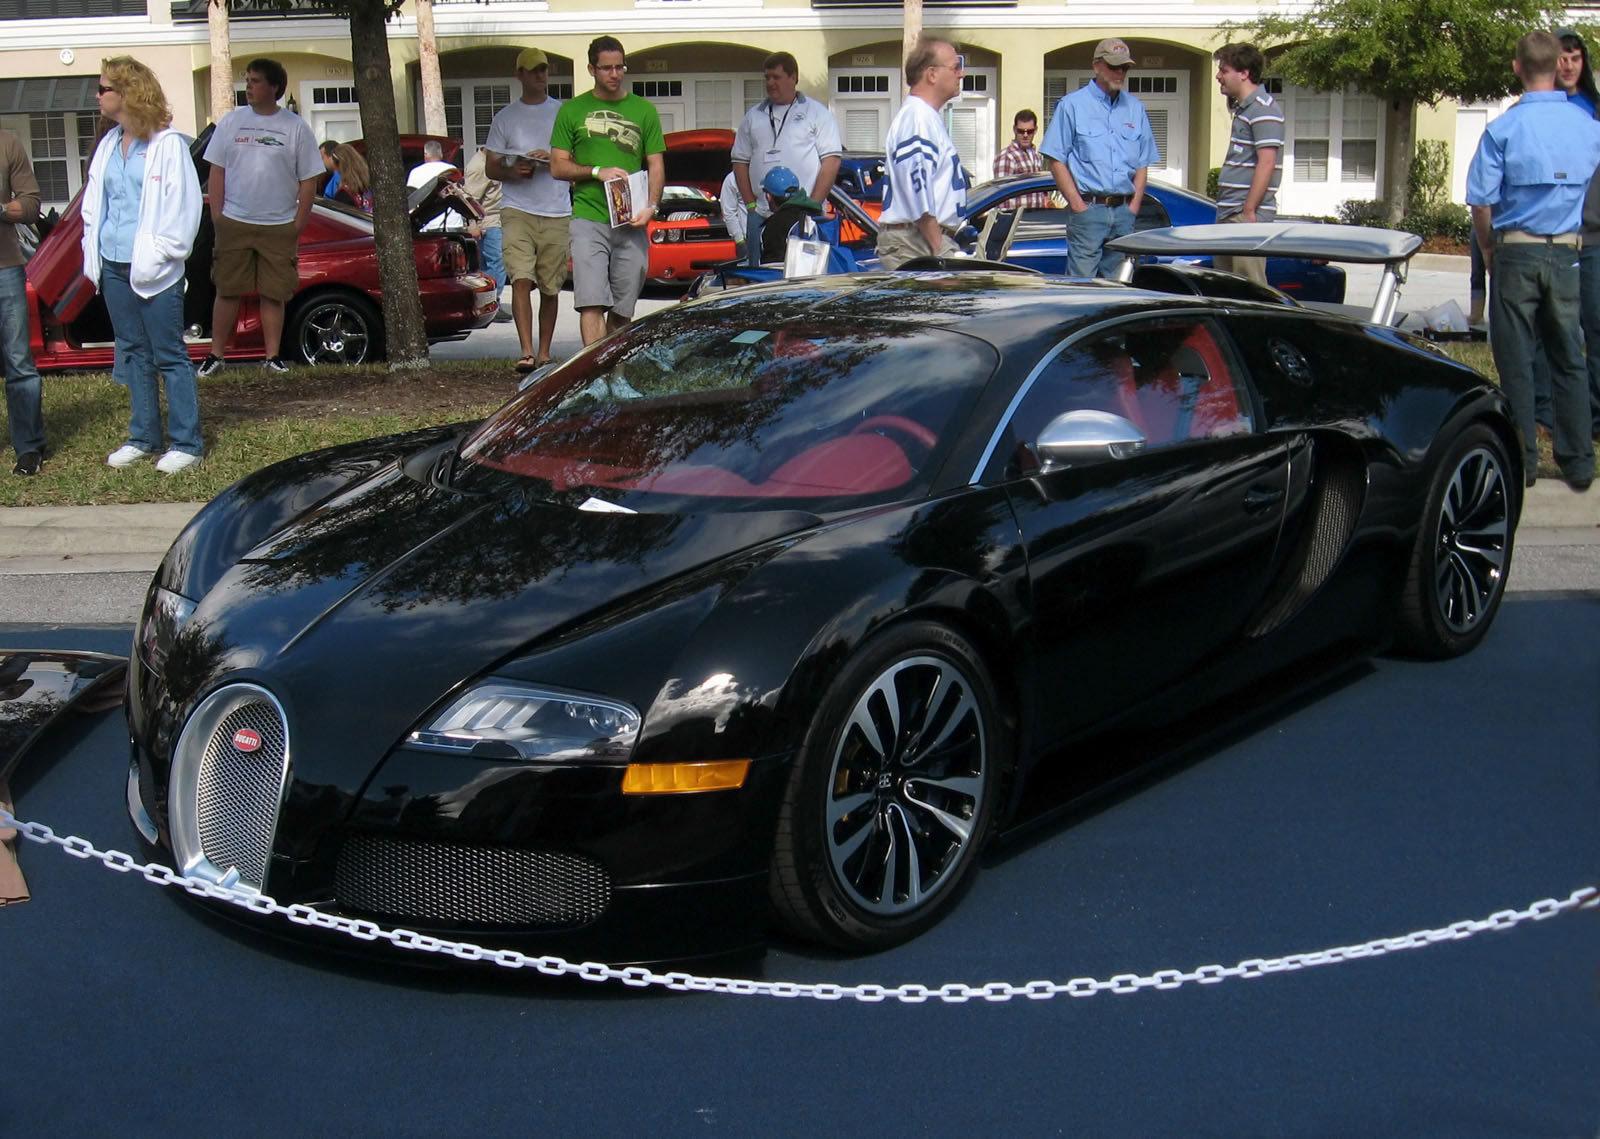 Bugatti Veyron Super Sport Hd Wallpaper Bugatti Veyron Black Cars Hd Wallpapers